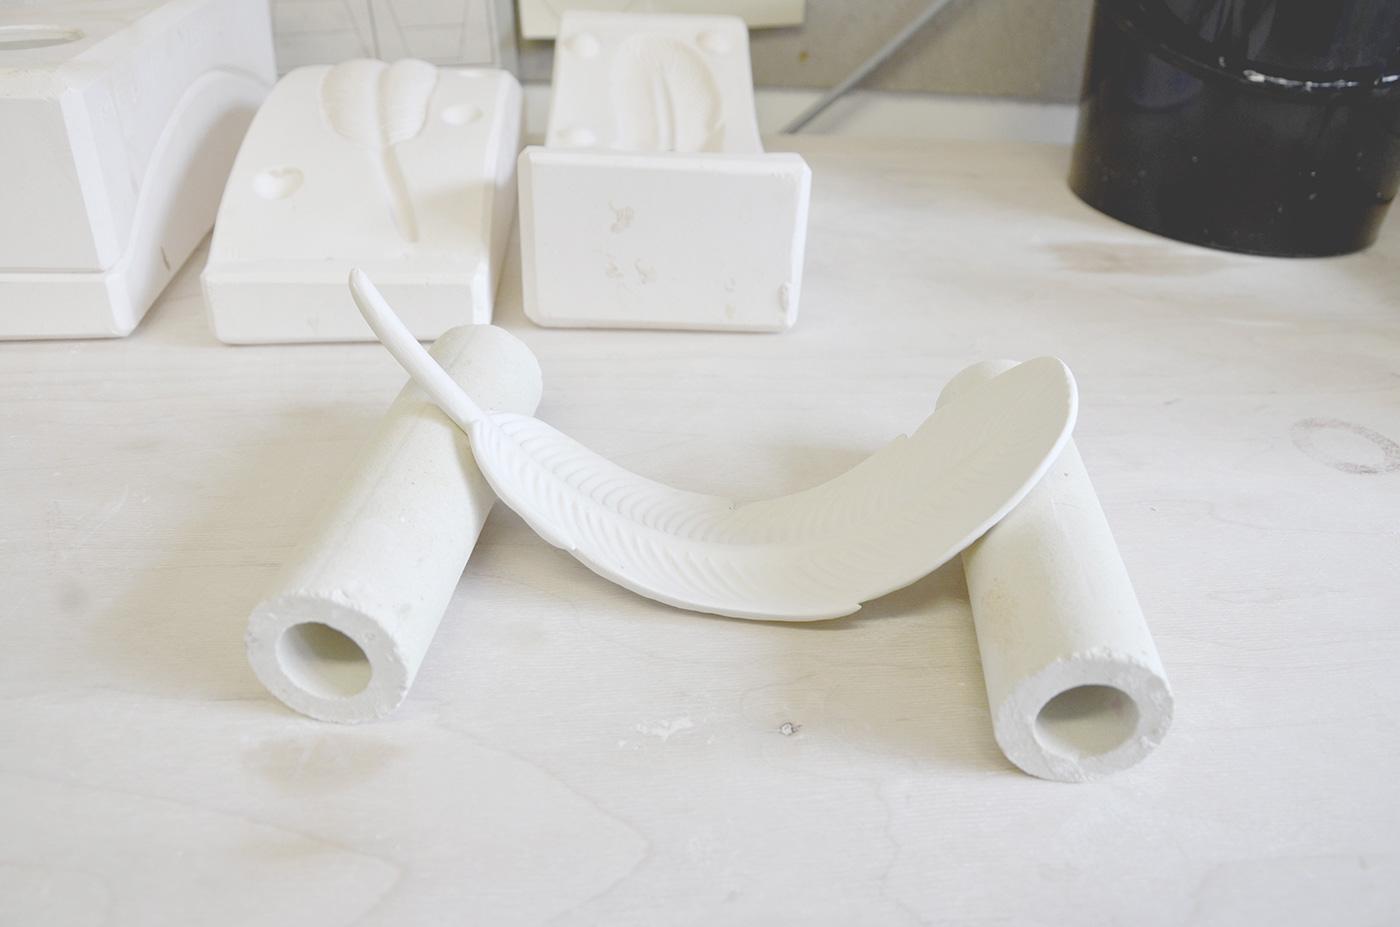 Journal-Plume-Porcelain-Curving